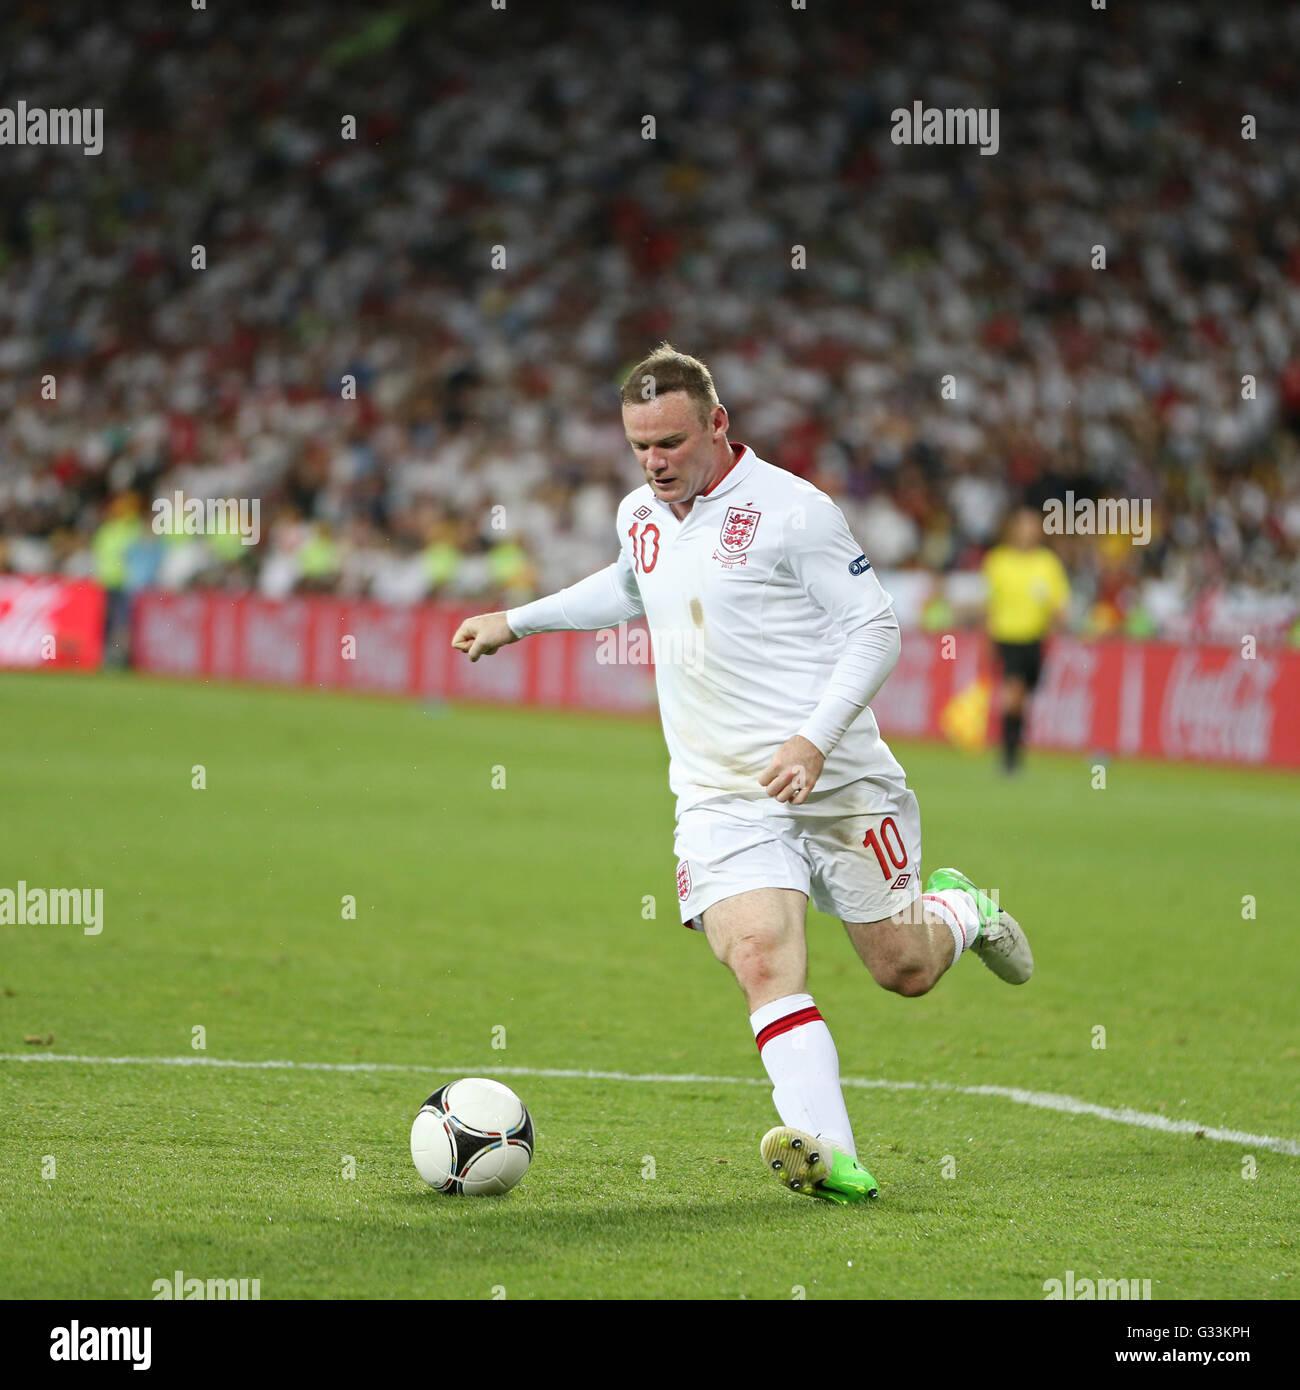 Wayne Rooney Celebrity Football Euro 2012 England Face Card Mask